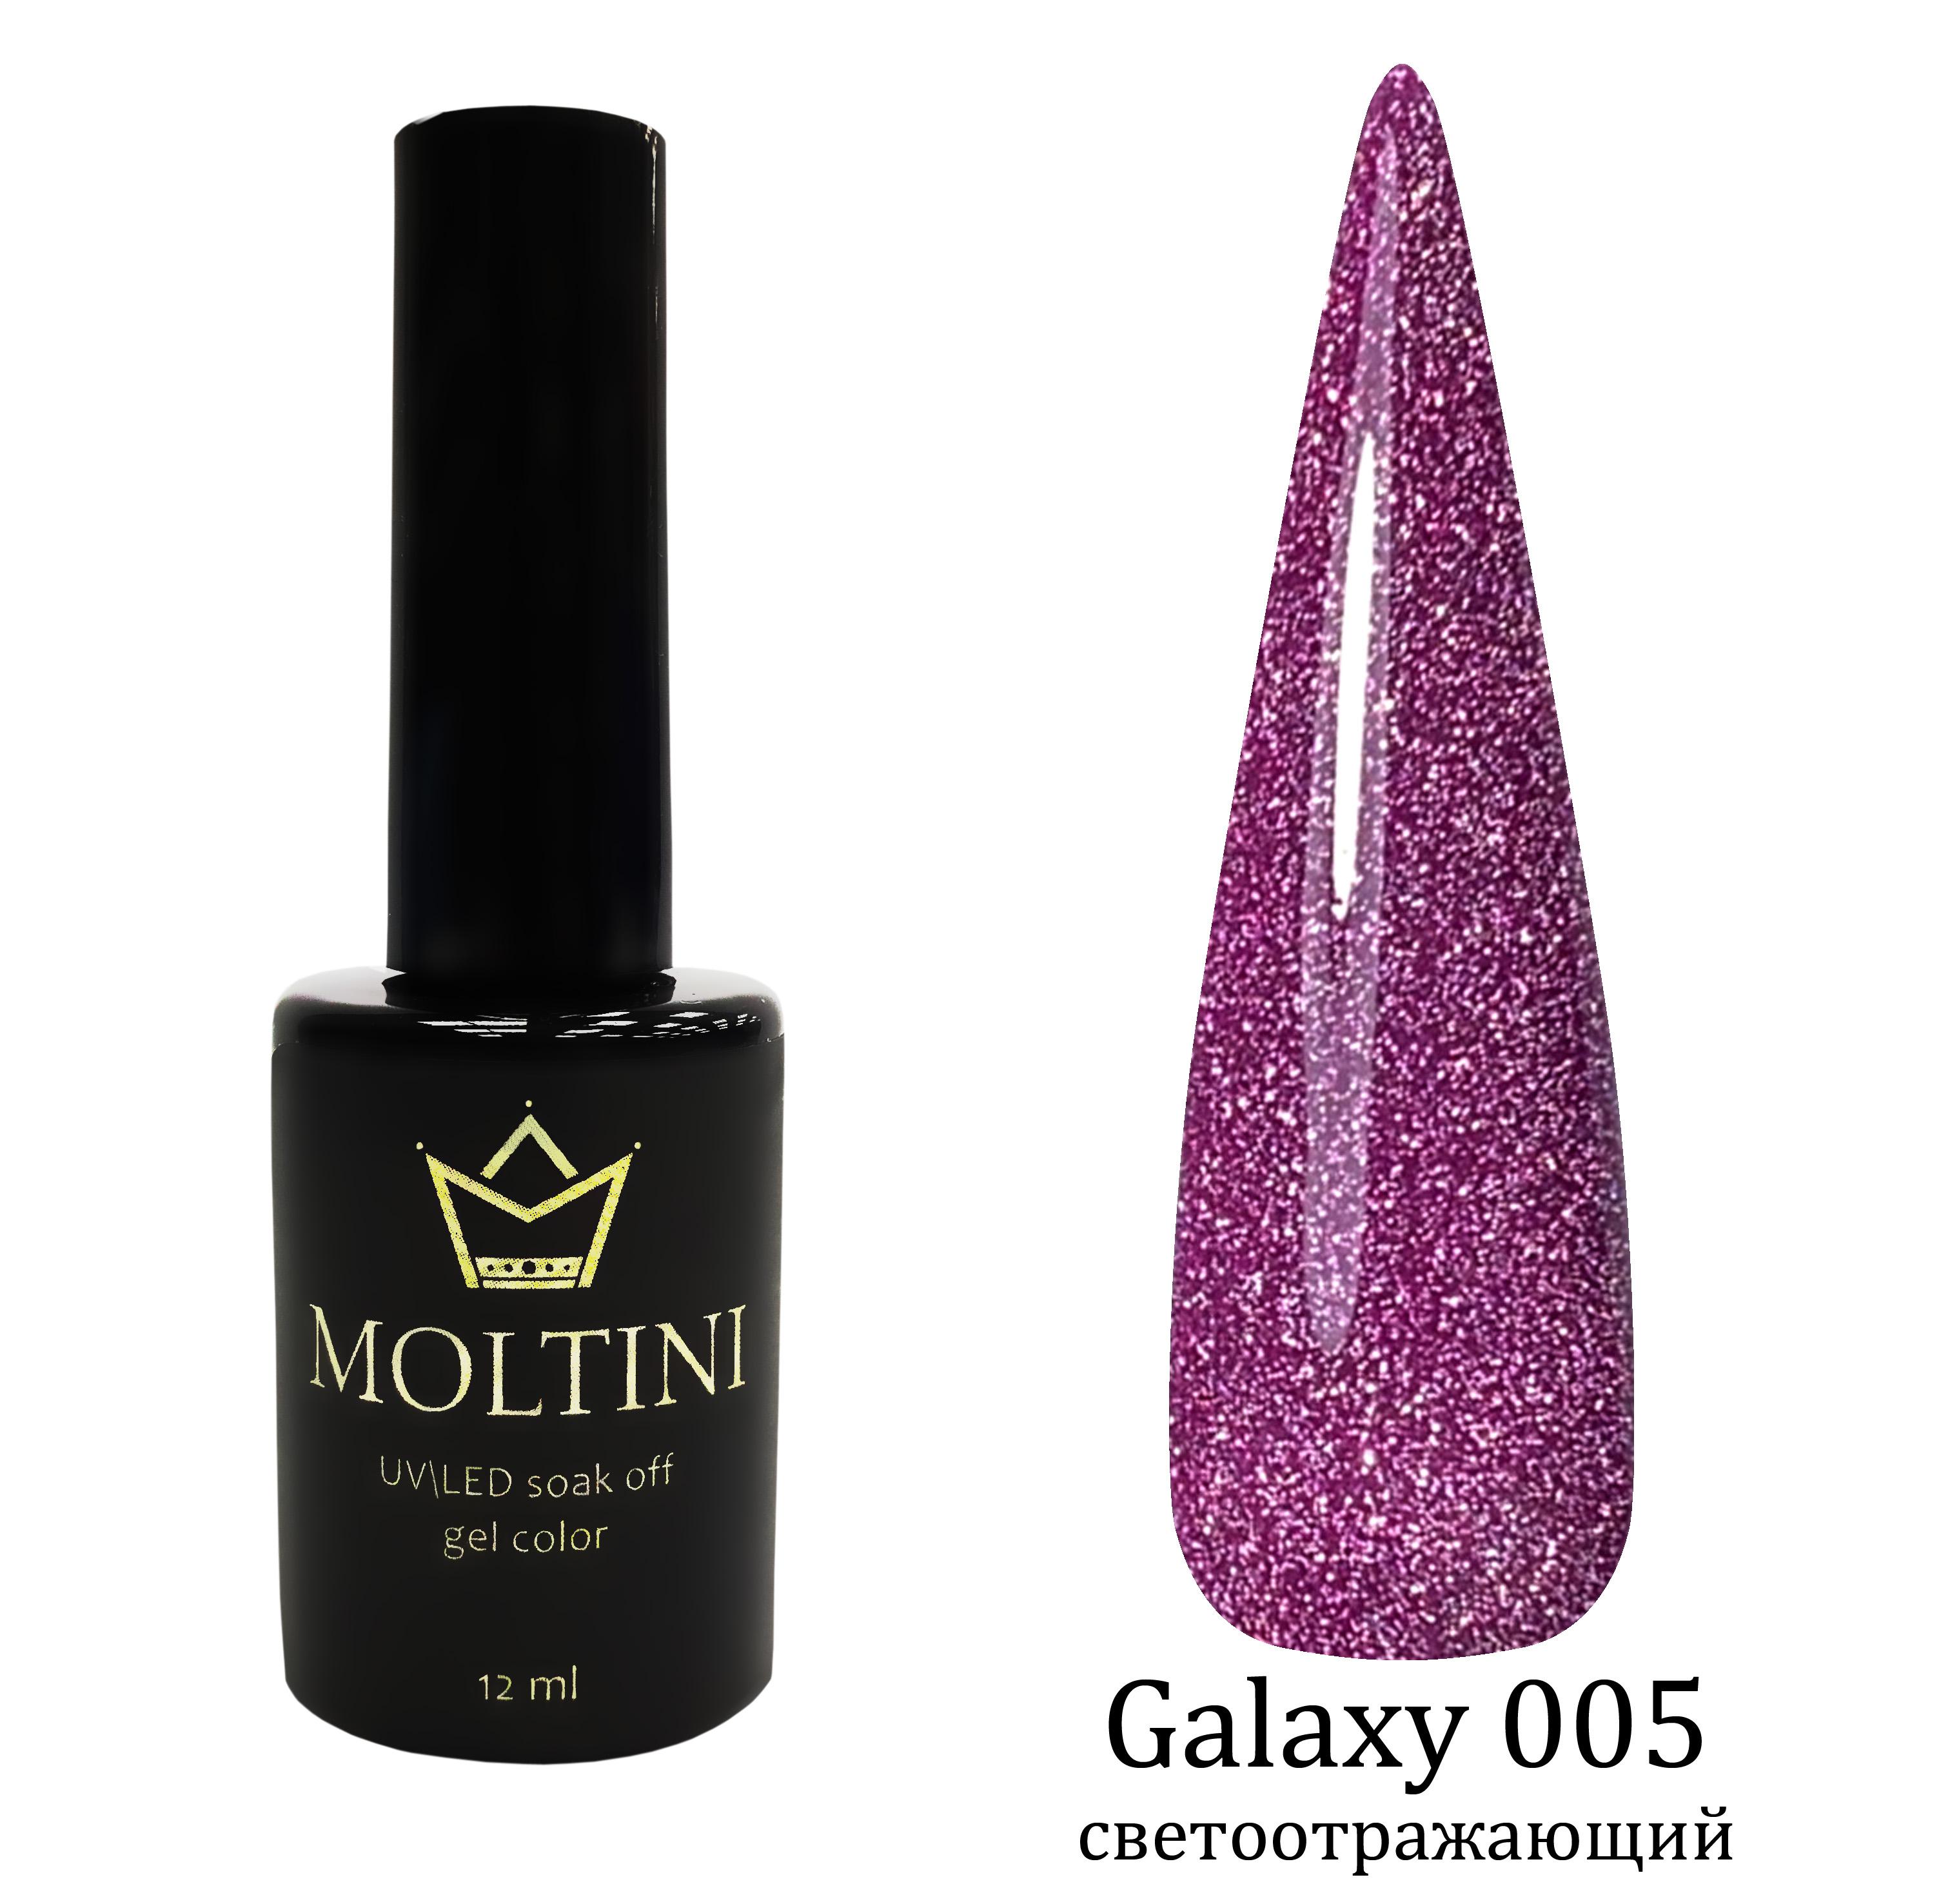 Гель-лак Moltini Galaxy 005, 12 ml